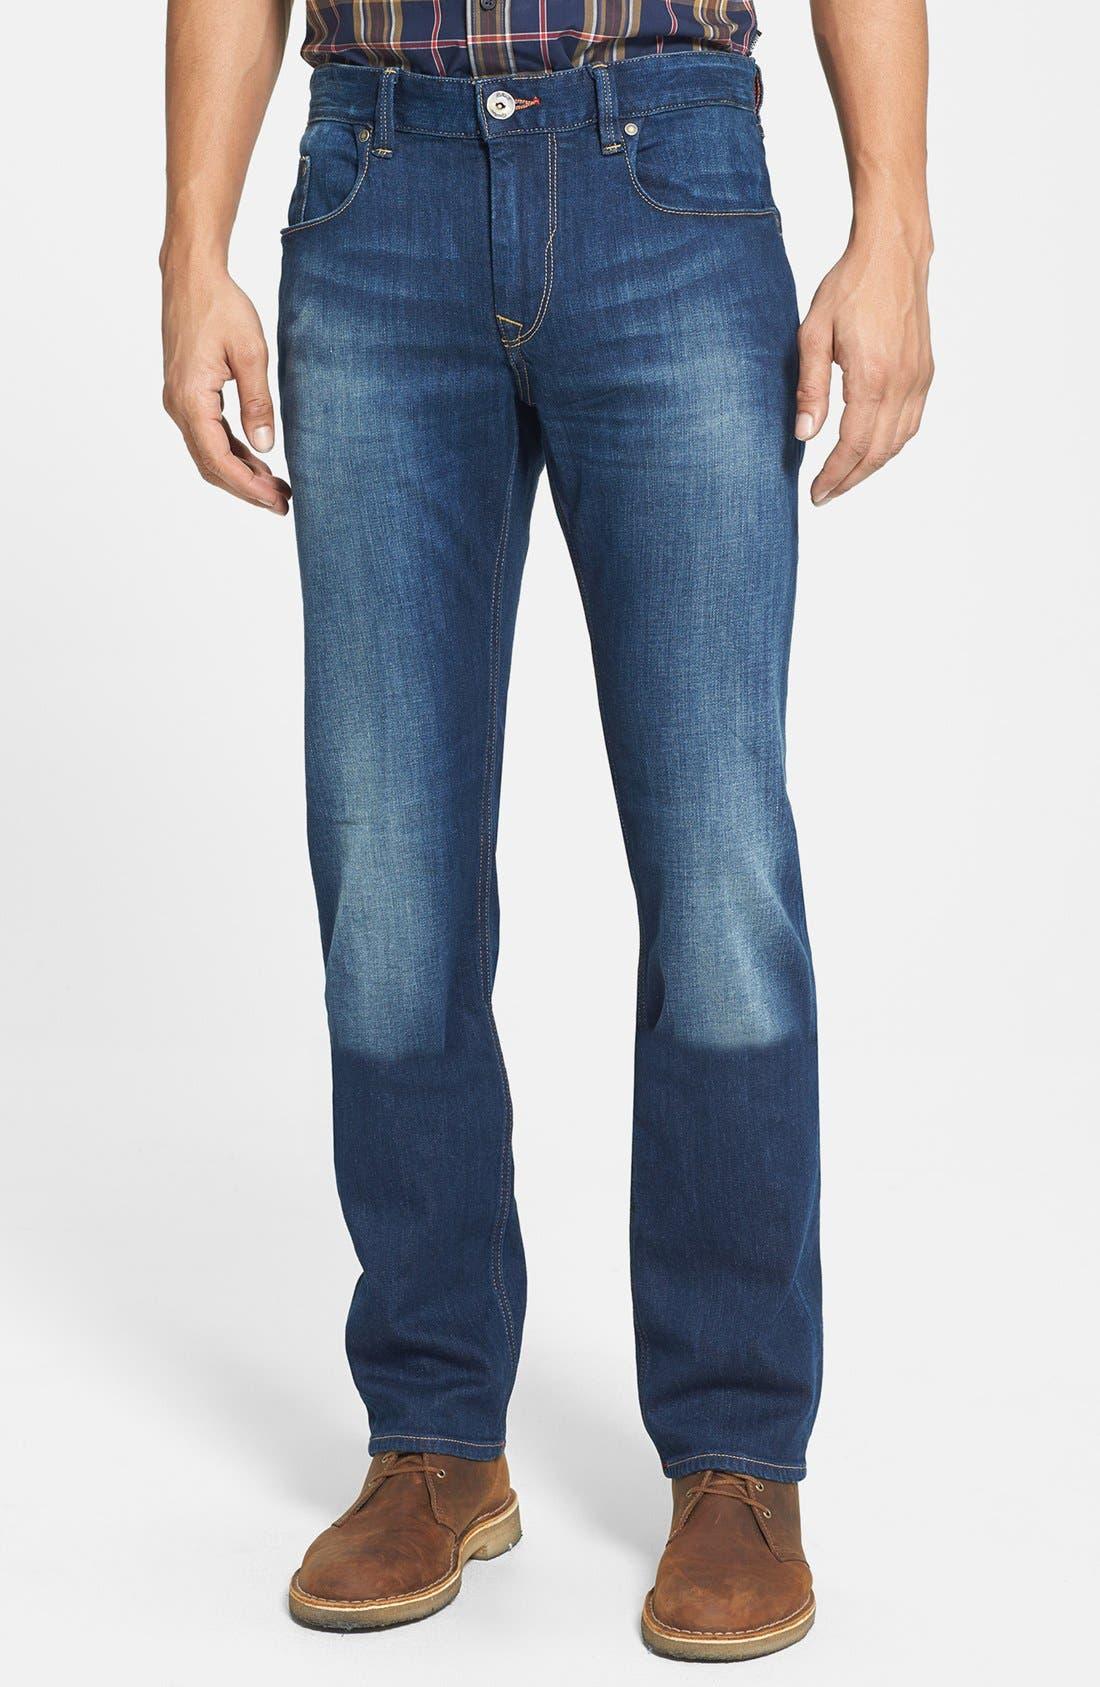 Main Image - Robert Graham 'Upside Down' Slim Fit Straight Leg Jeans